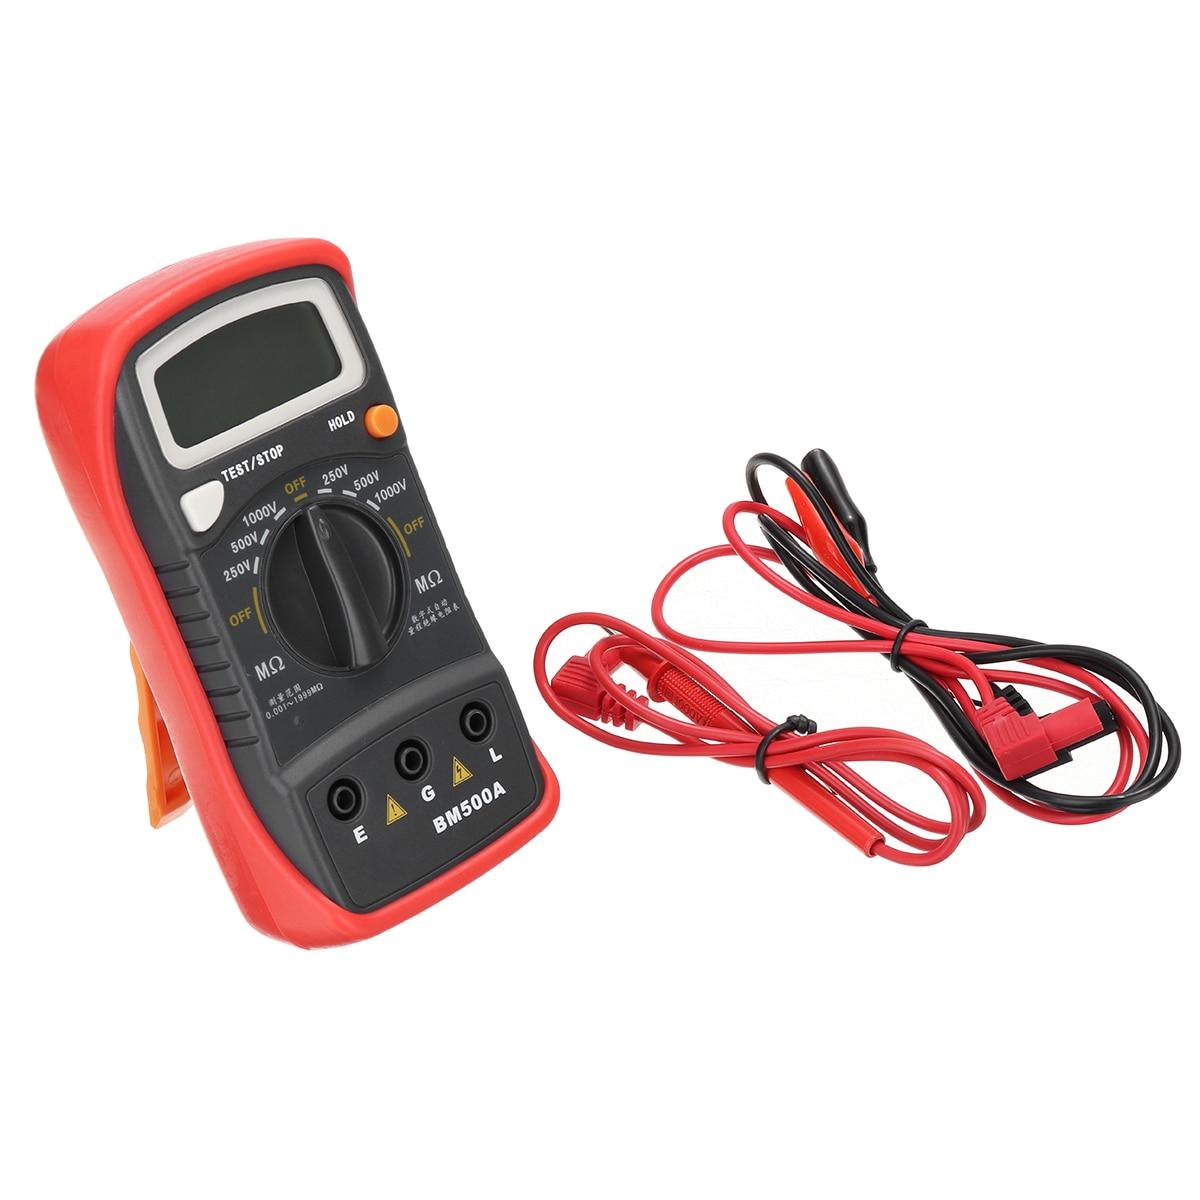 1000V BM500A Handheld Digital LCD Resistance Tester High Accuracy Insulation Resistance Testing Meter Megohmmeter Megger потолочный светодиодный светильник omnilux oml 48807 48